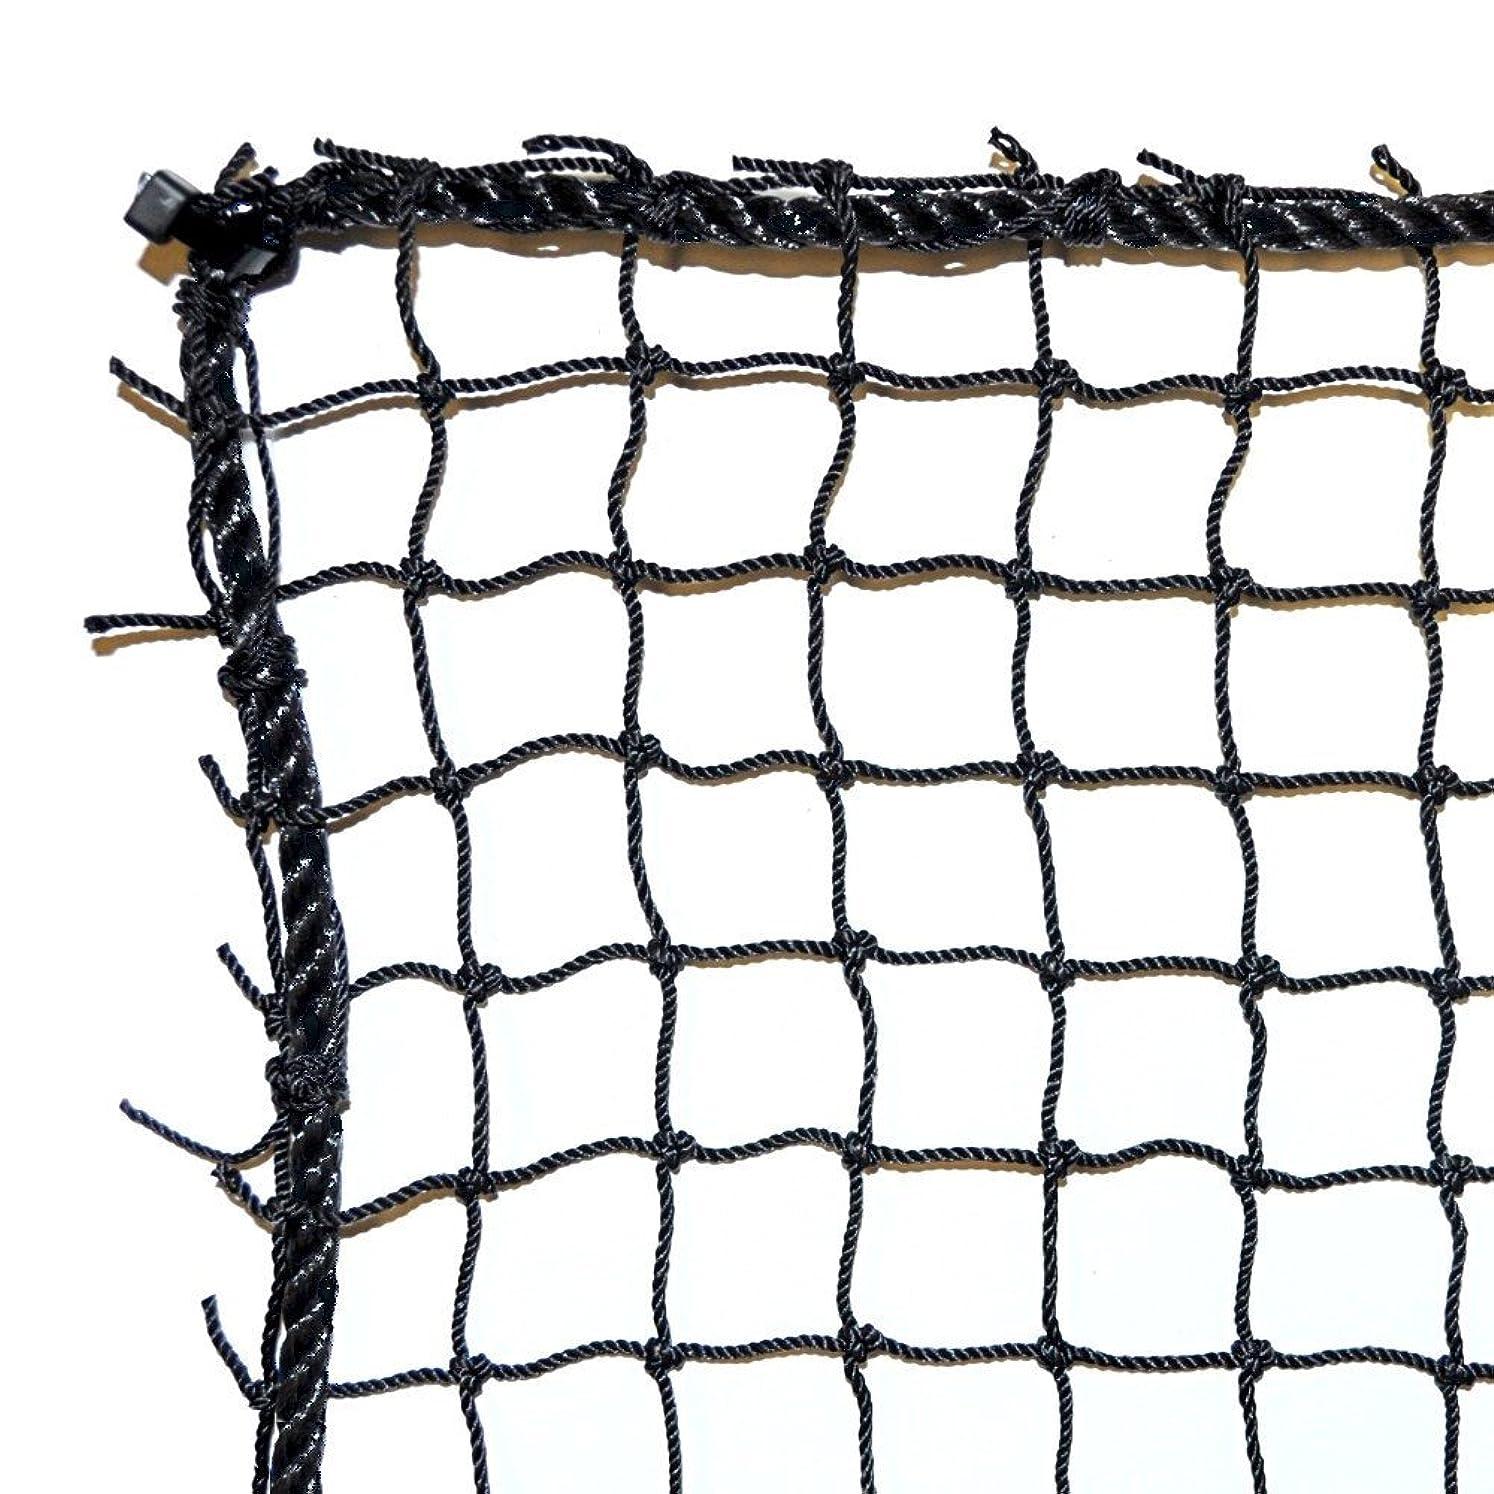 Dynamax Sports Golf Practice/Barrier Net, Black, 10X10-ft pjkpfhqcd8676287